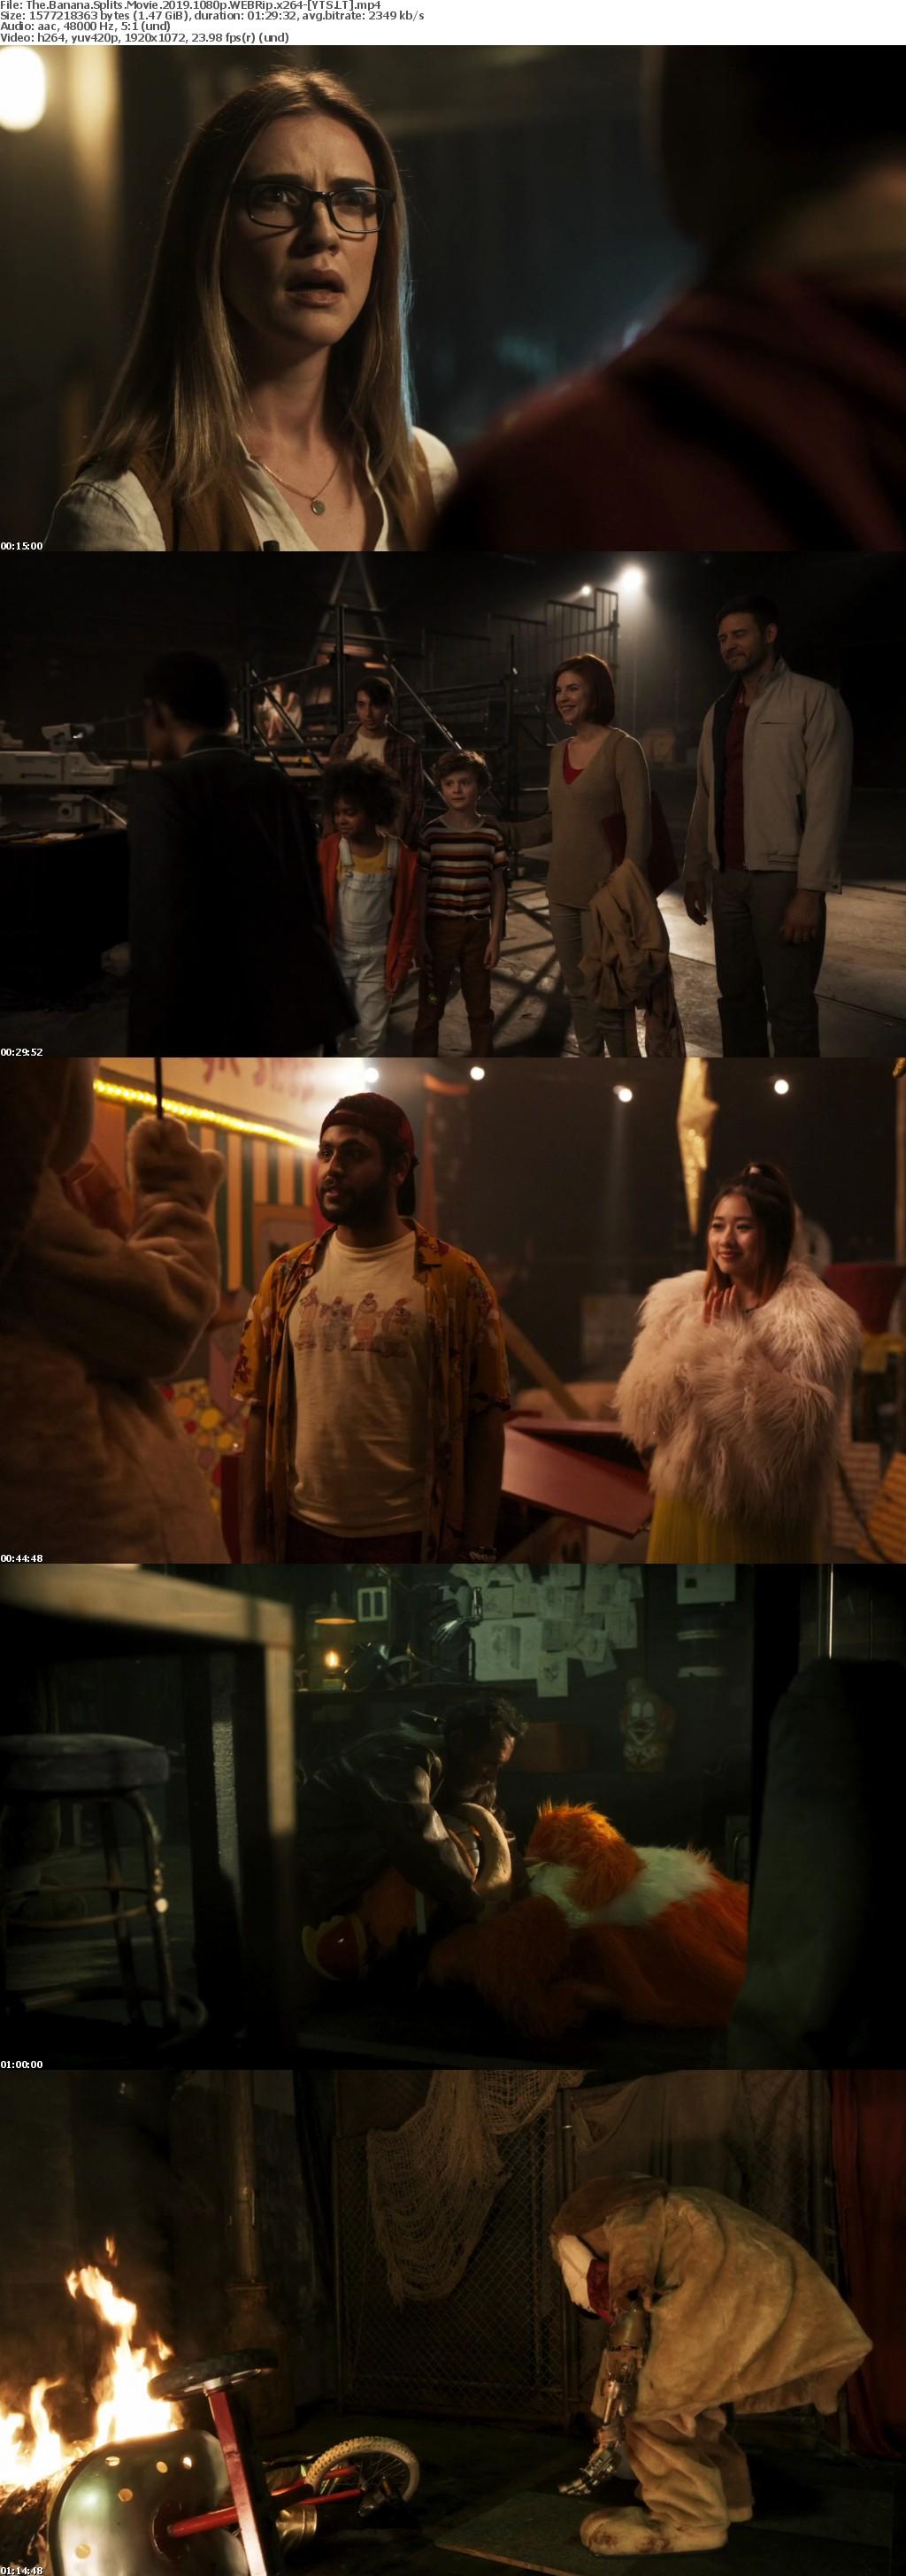 The Banana Splits Movie 2019 [WEBRip] [1080p] YIFY